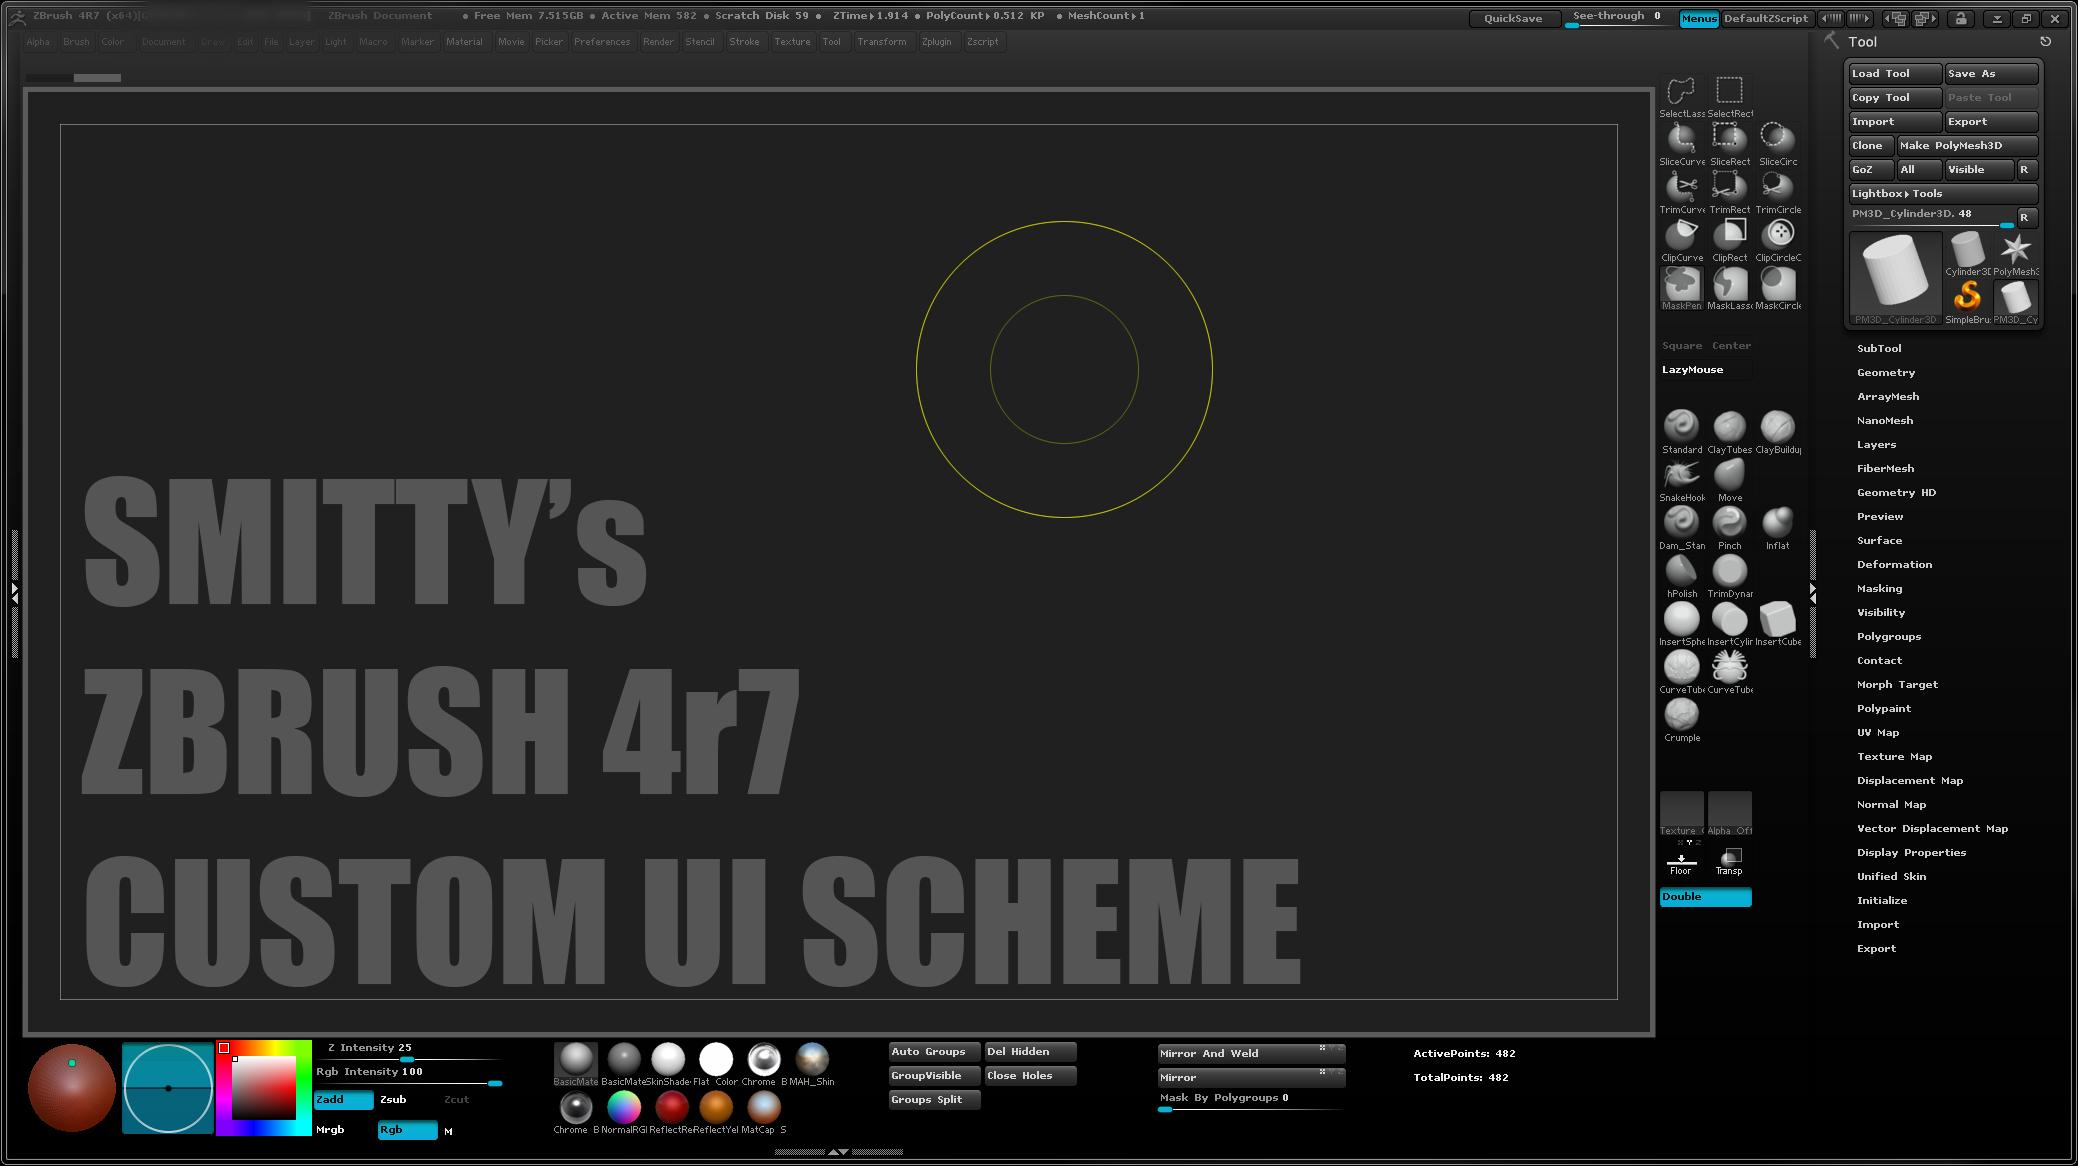 Smitty's Custom ZBrush 4r7 UI by Art-by-Smitty on DeviantArt